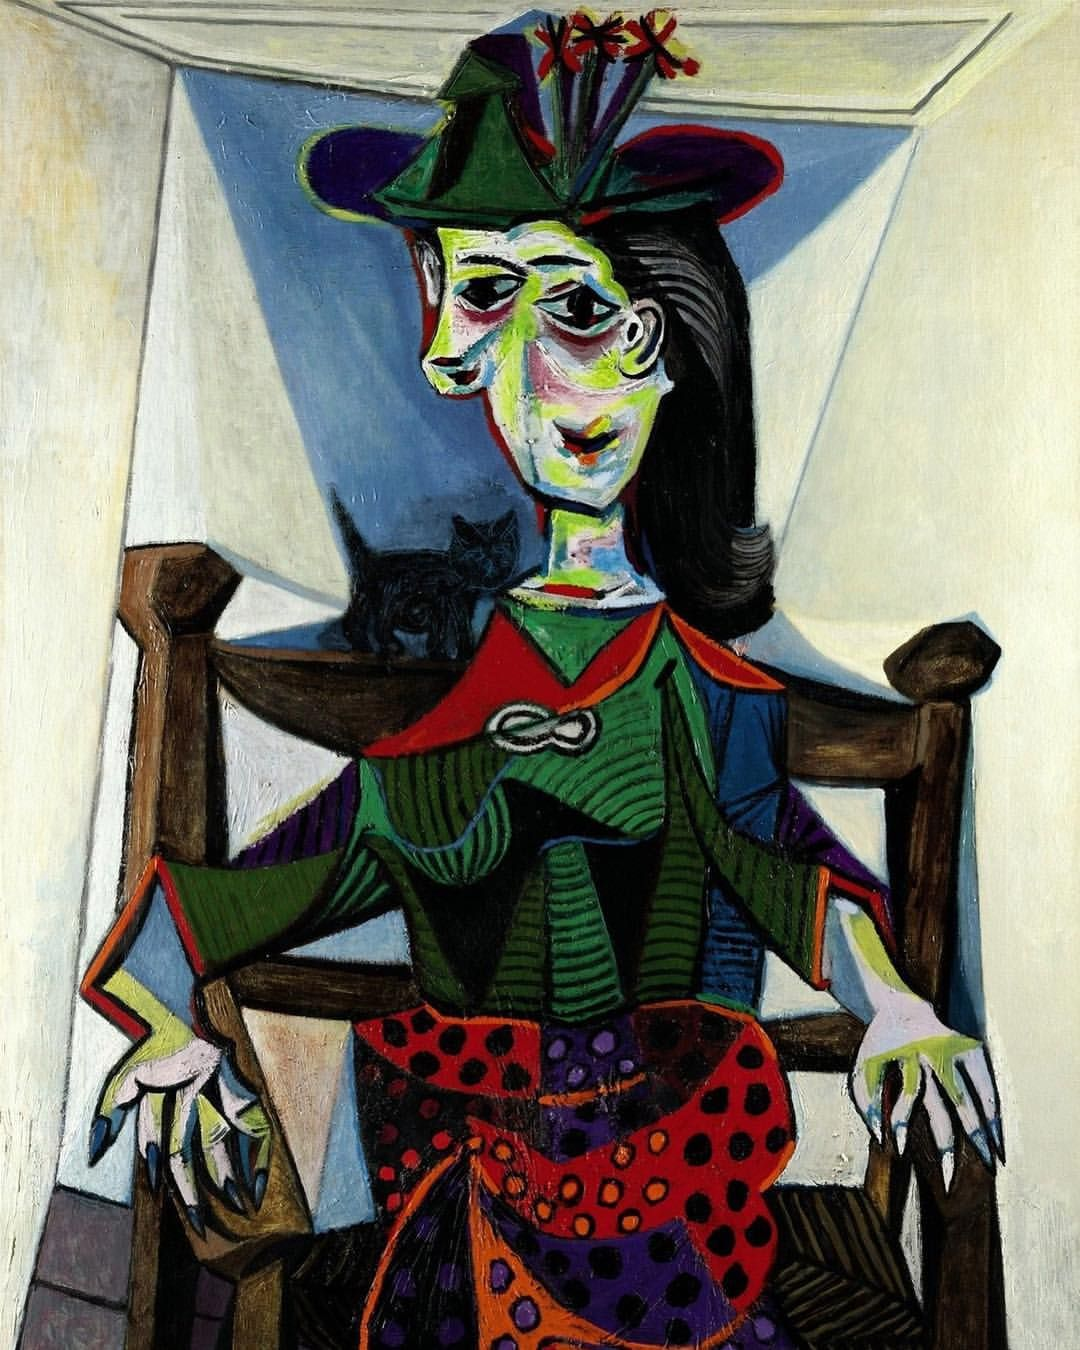 Dora Maar au Chat. Pablo Picasso, 1941. | Picasso artwork, Pablo picasso  artwork, Picasso art